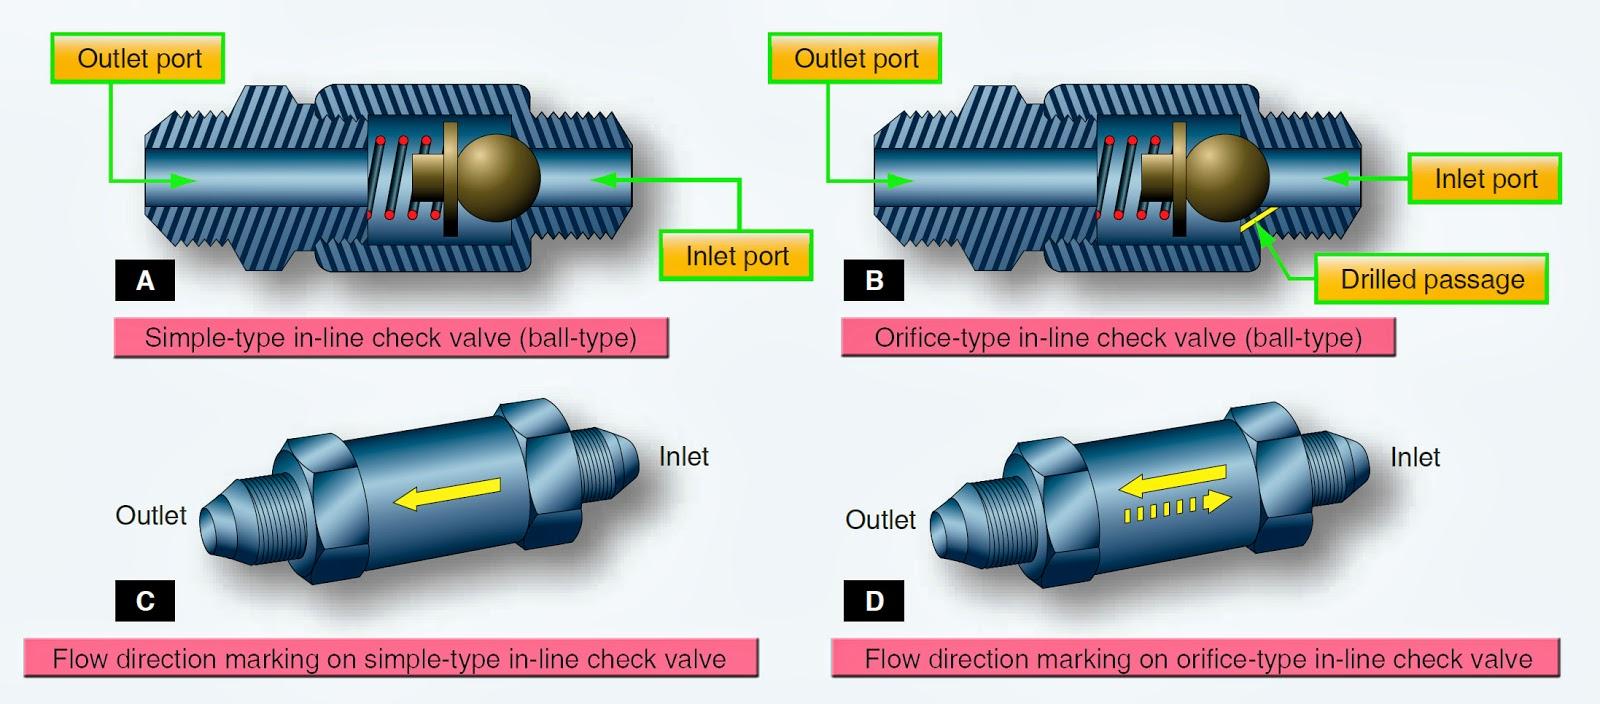 jeep fuel tank hose diagram  jeep  free engine image for